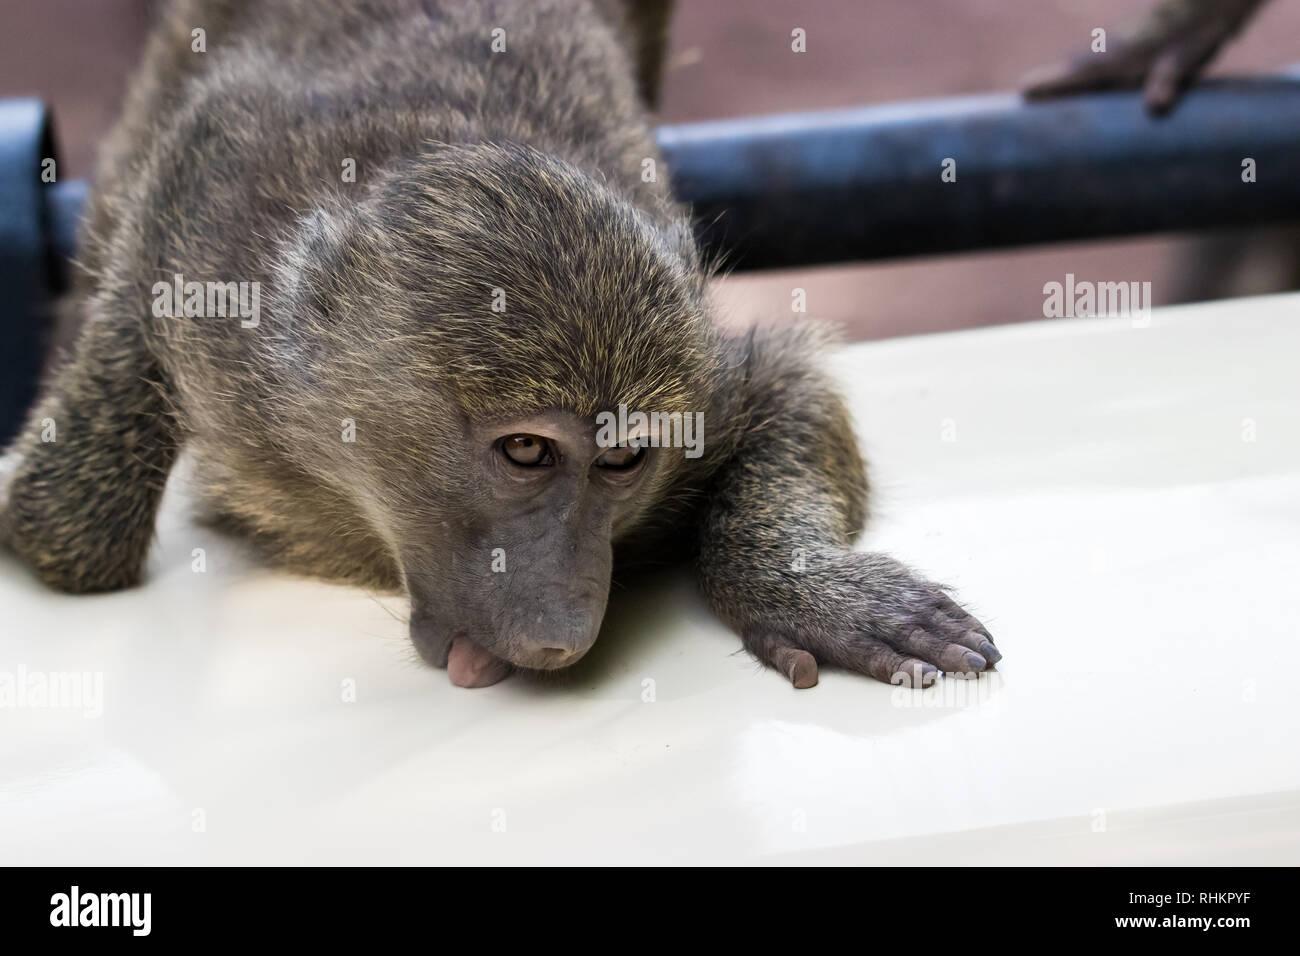 Young baboon - Stock Image